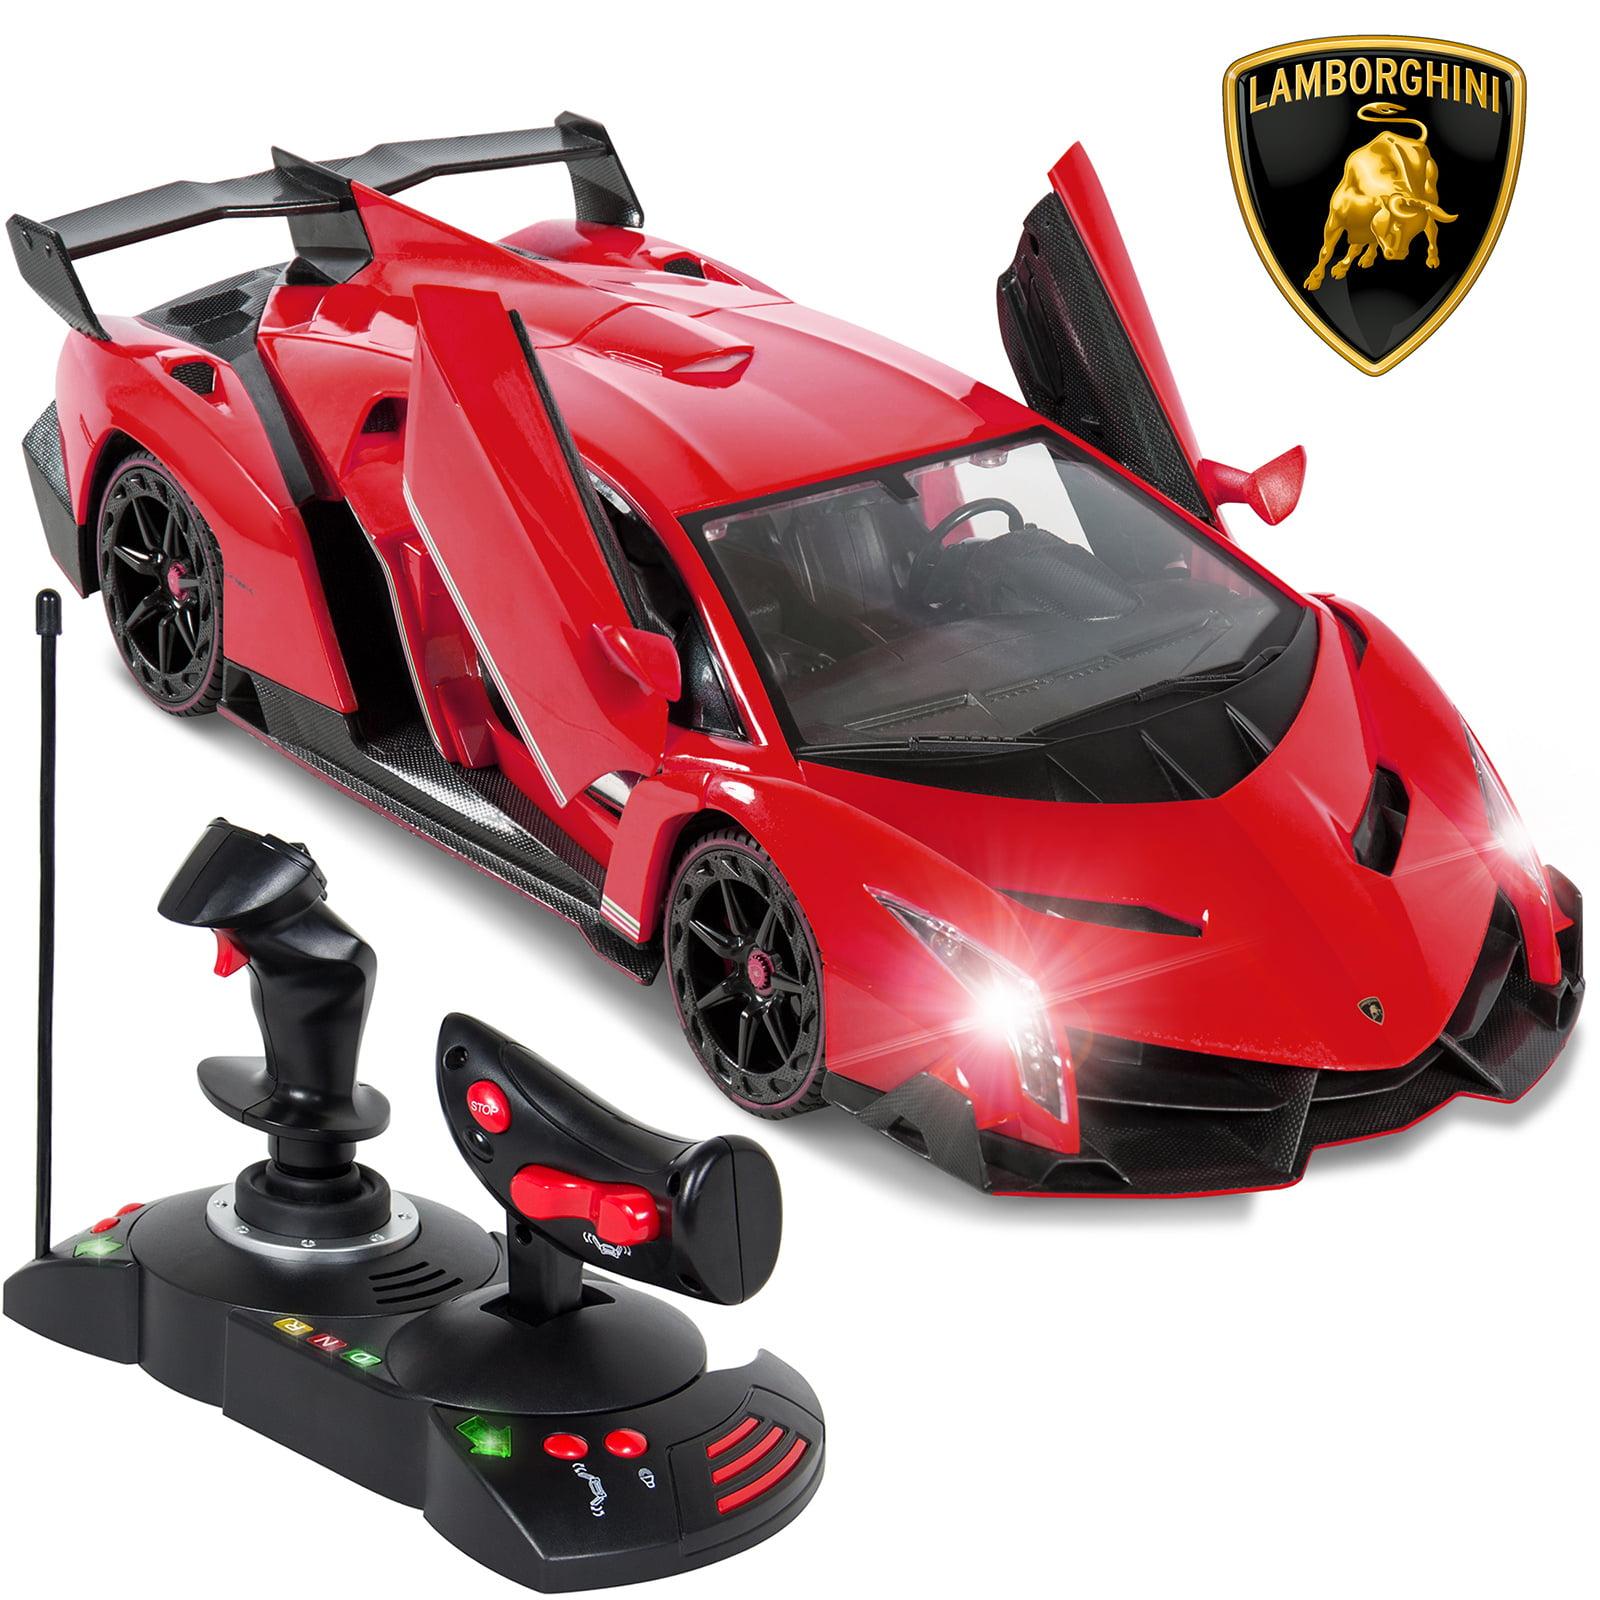 Best Choice Products 1/14 Scale Remote Control Car Lamborghini Veneno w/ Gravity Sensor, Engine Sounds, Lights - Red